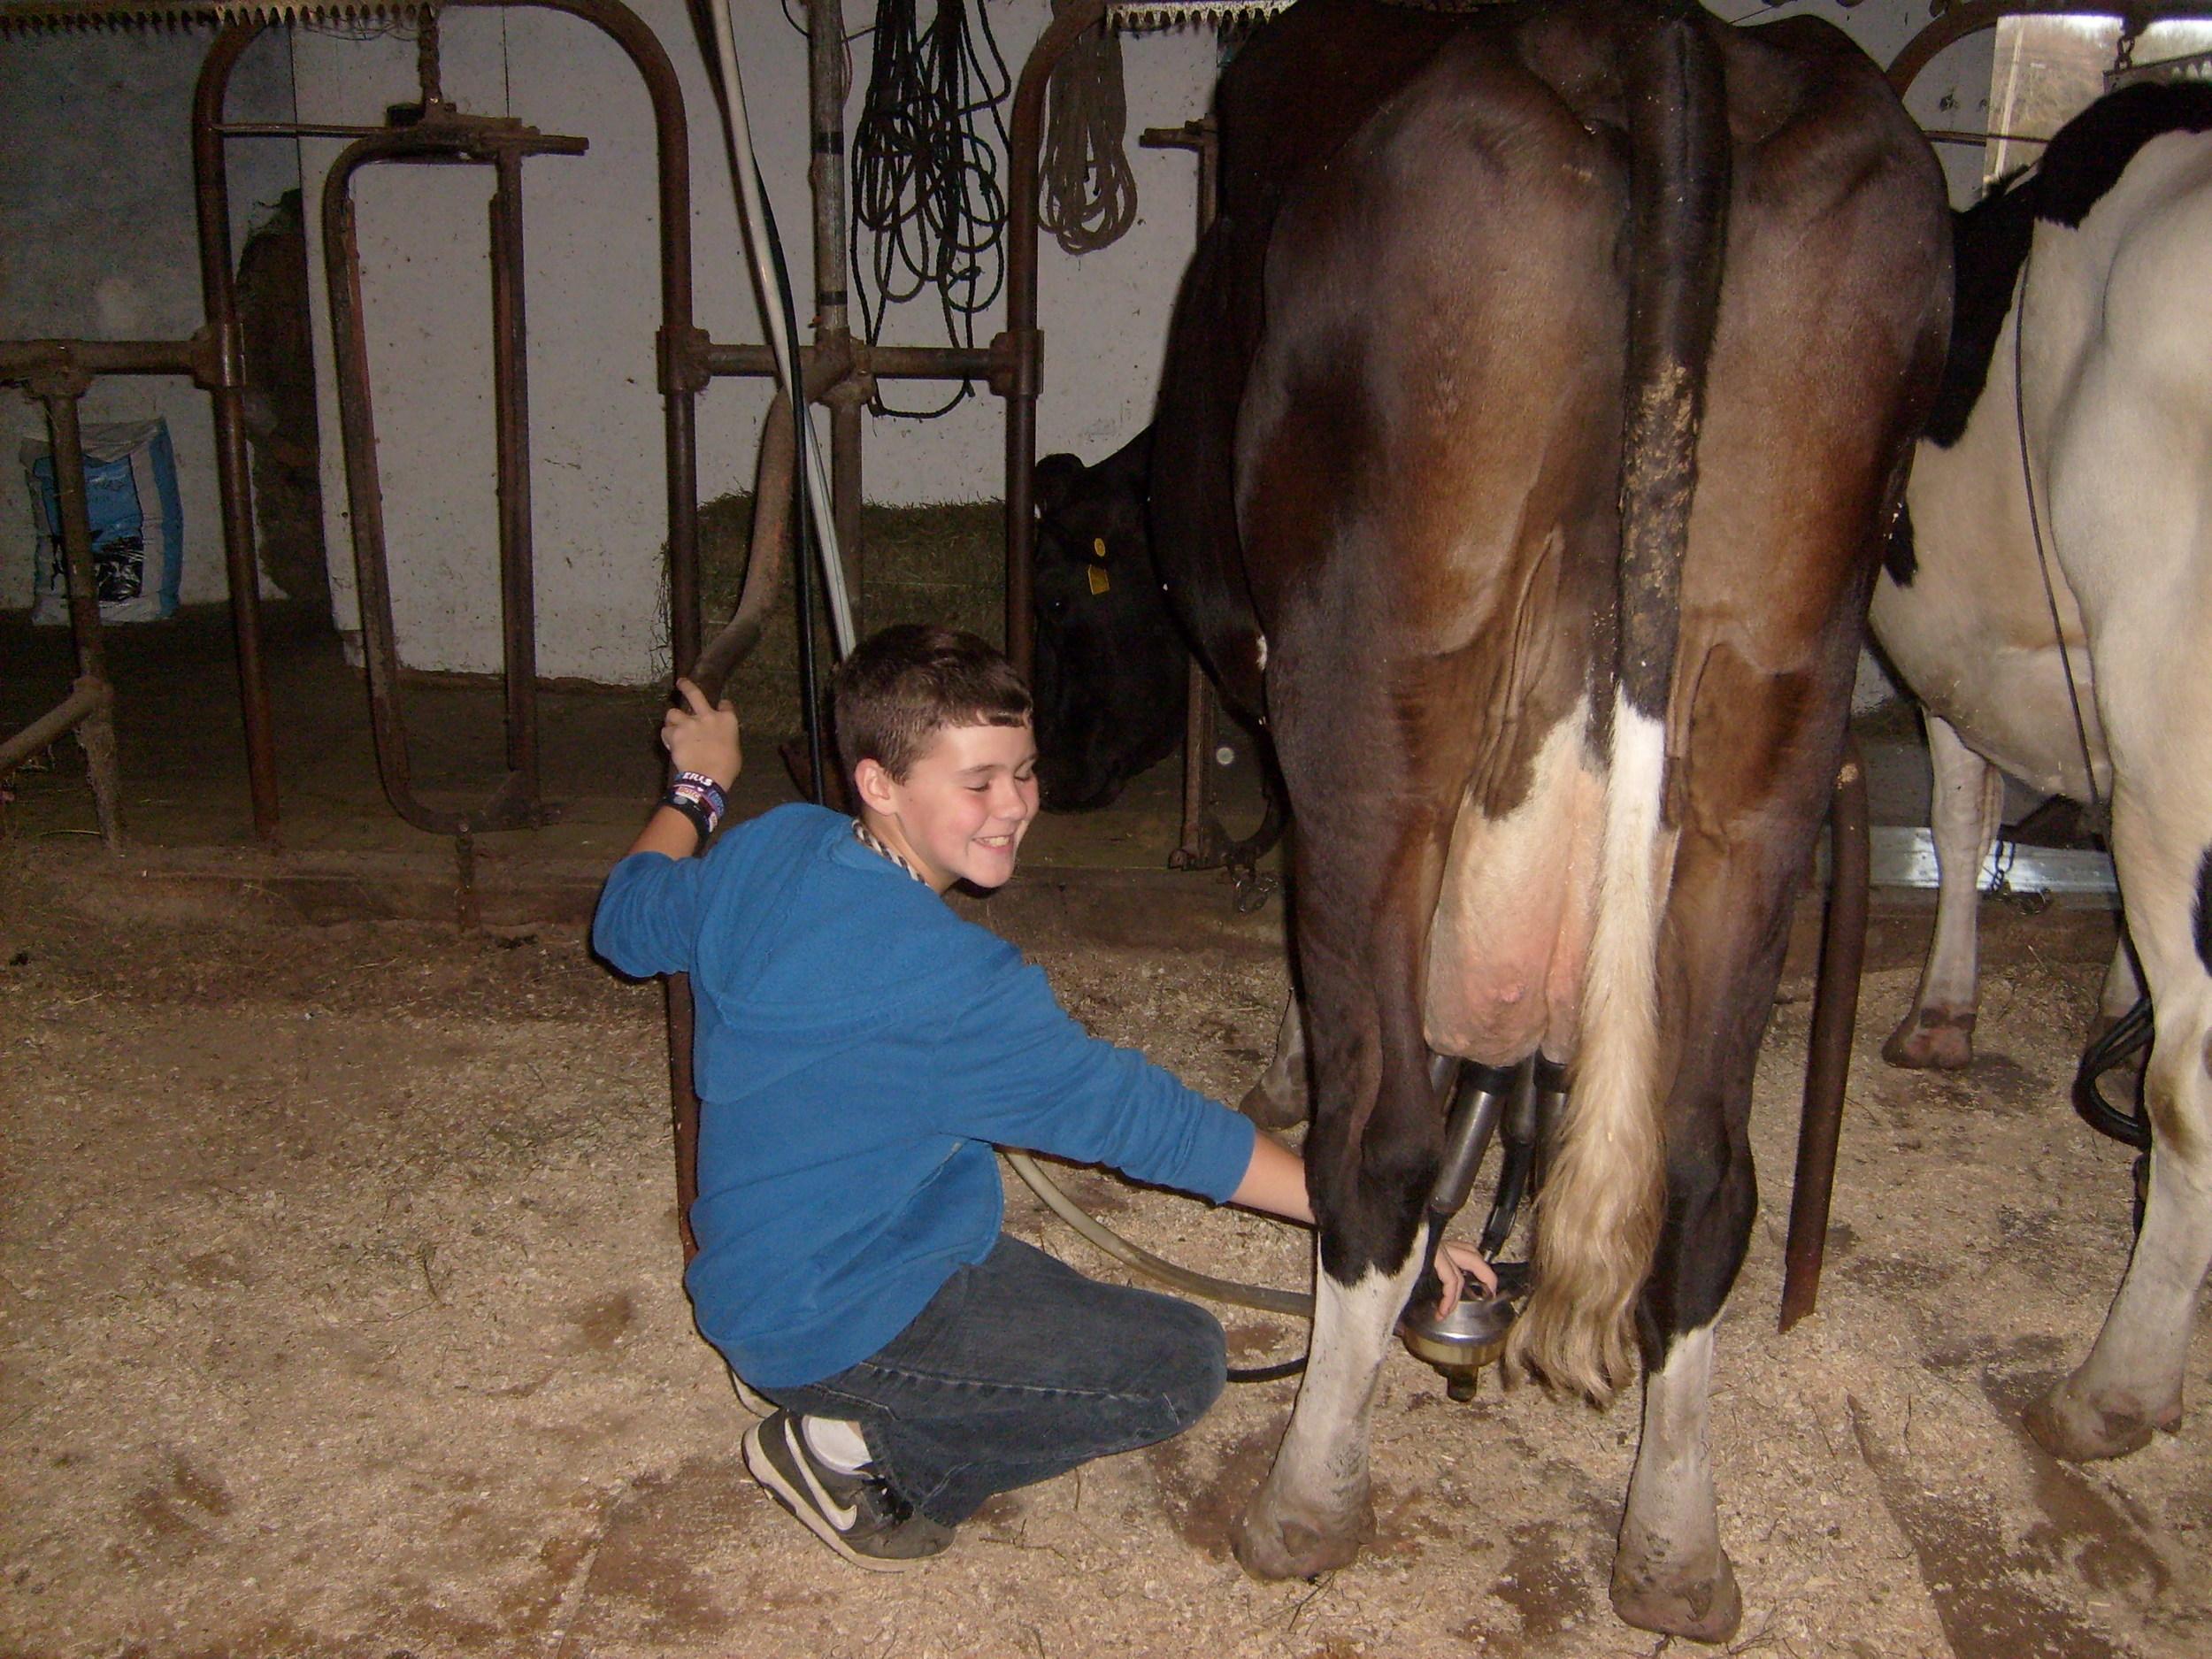 boy_milking_cow.JPG